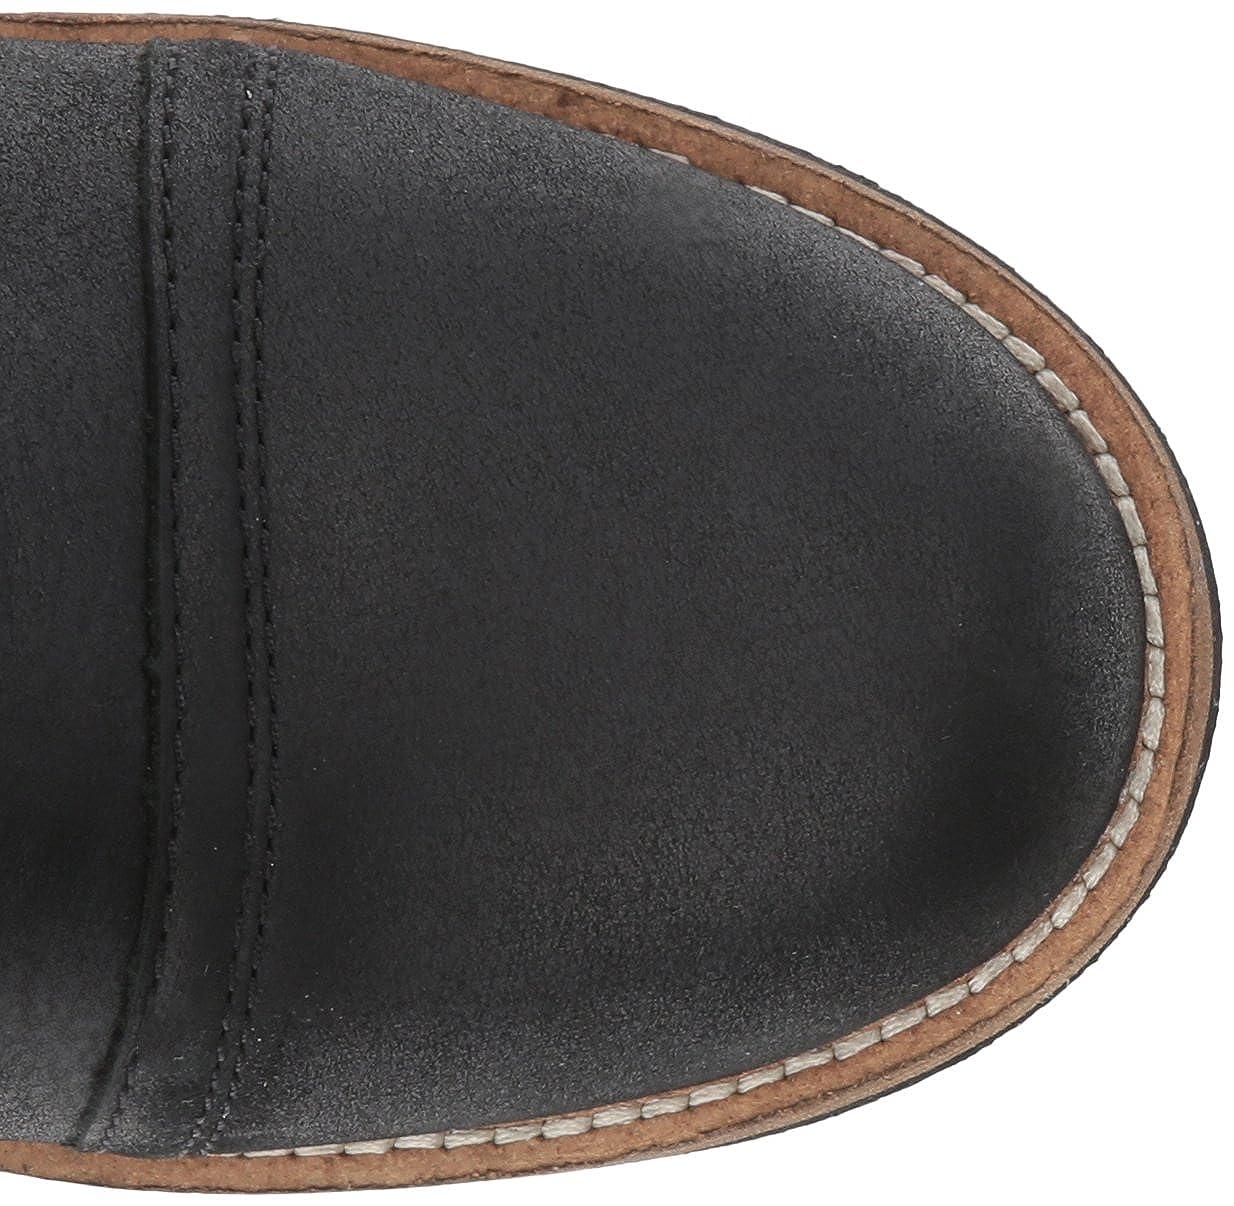 Amazon.com: Kodiak Bethany de la mujer Mid Calf Botas: Shoes